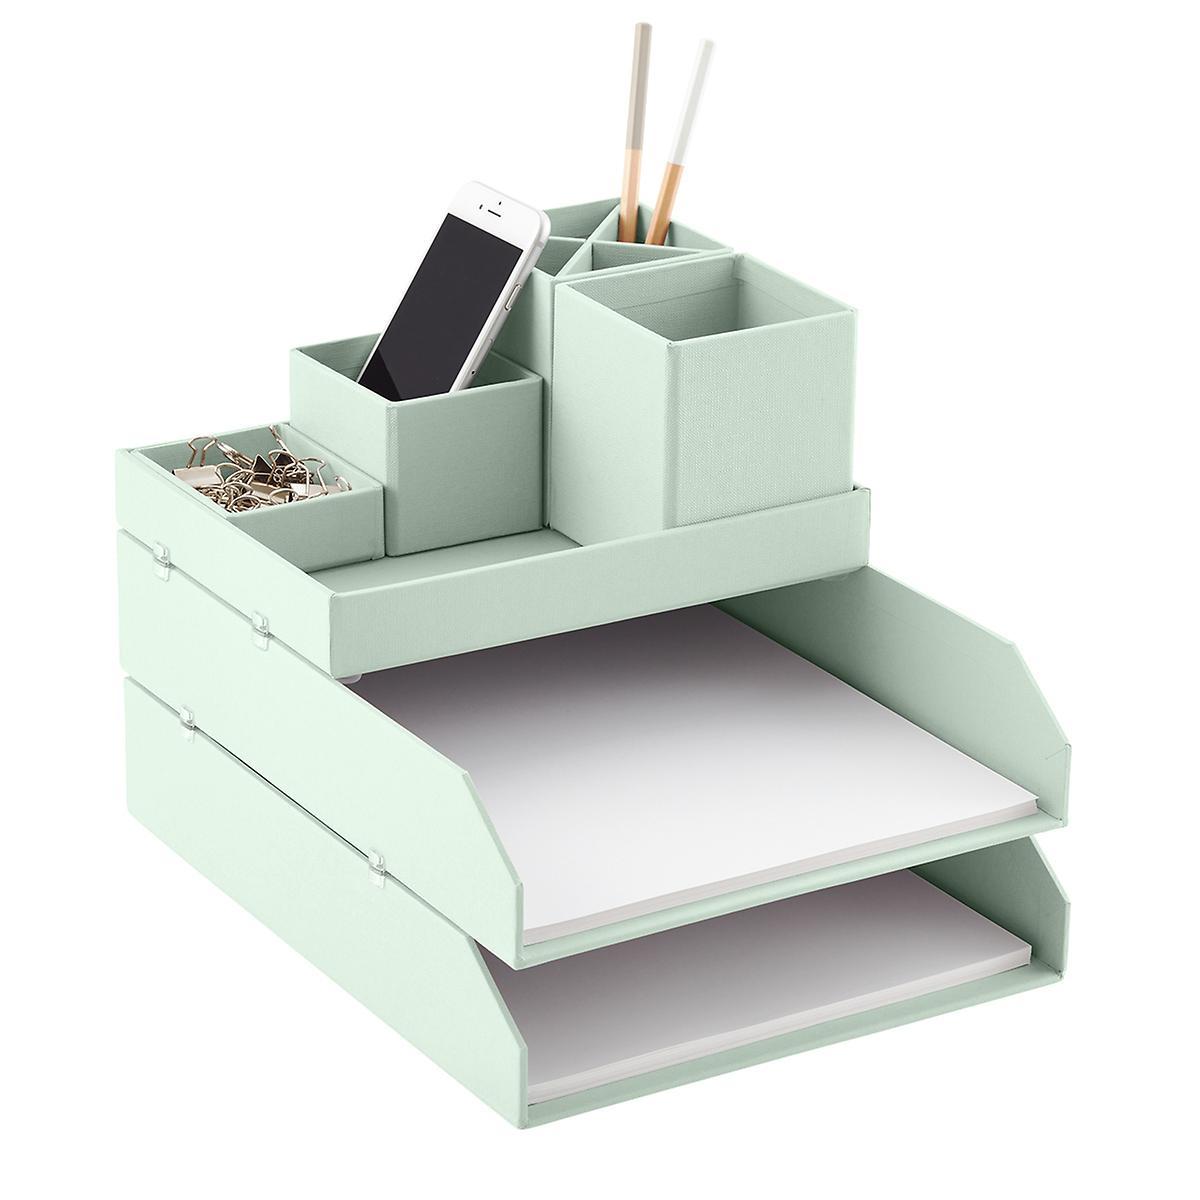 Famous Bigso Mint Stockholm Desktop Organizer | The Container Store CS86